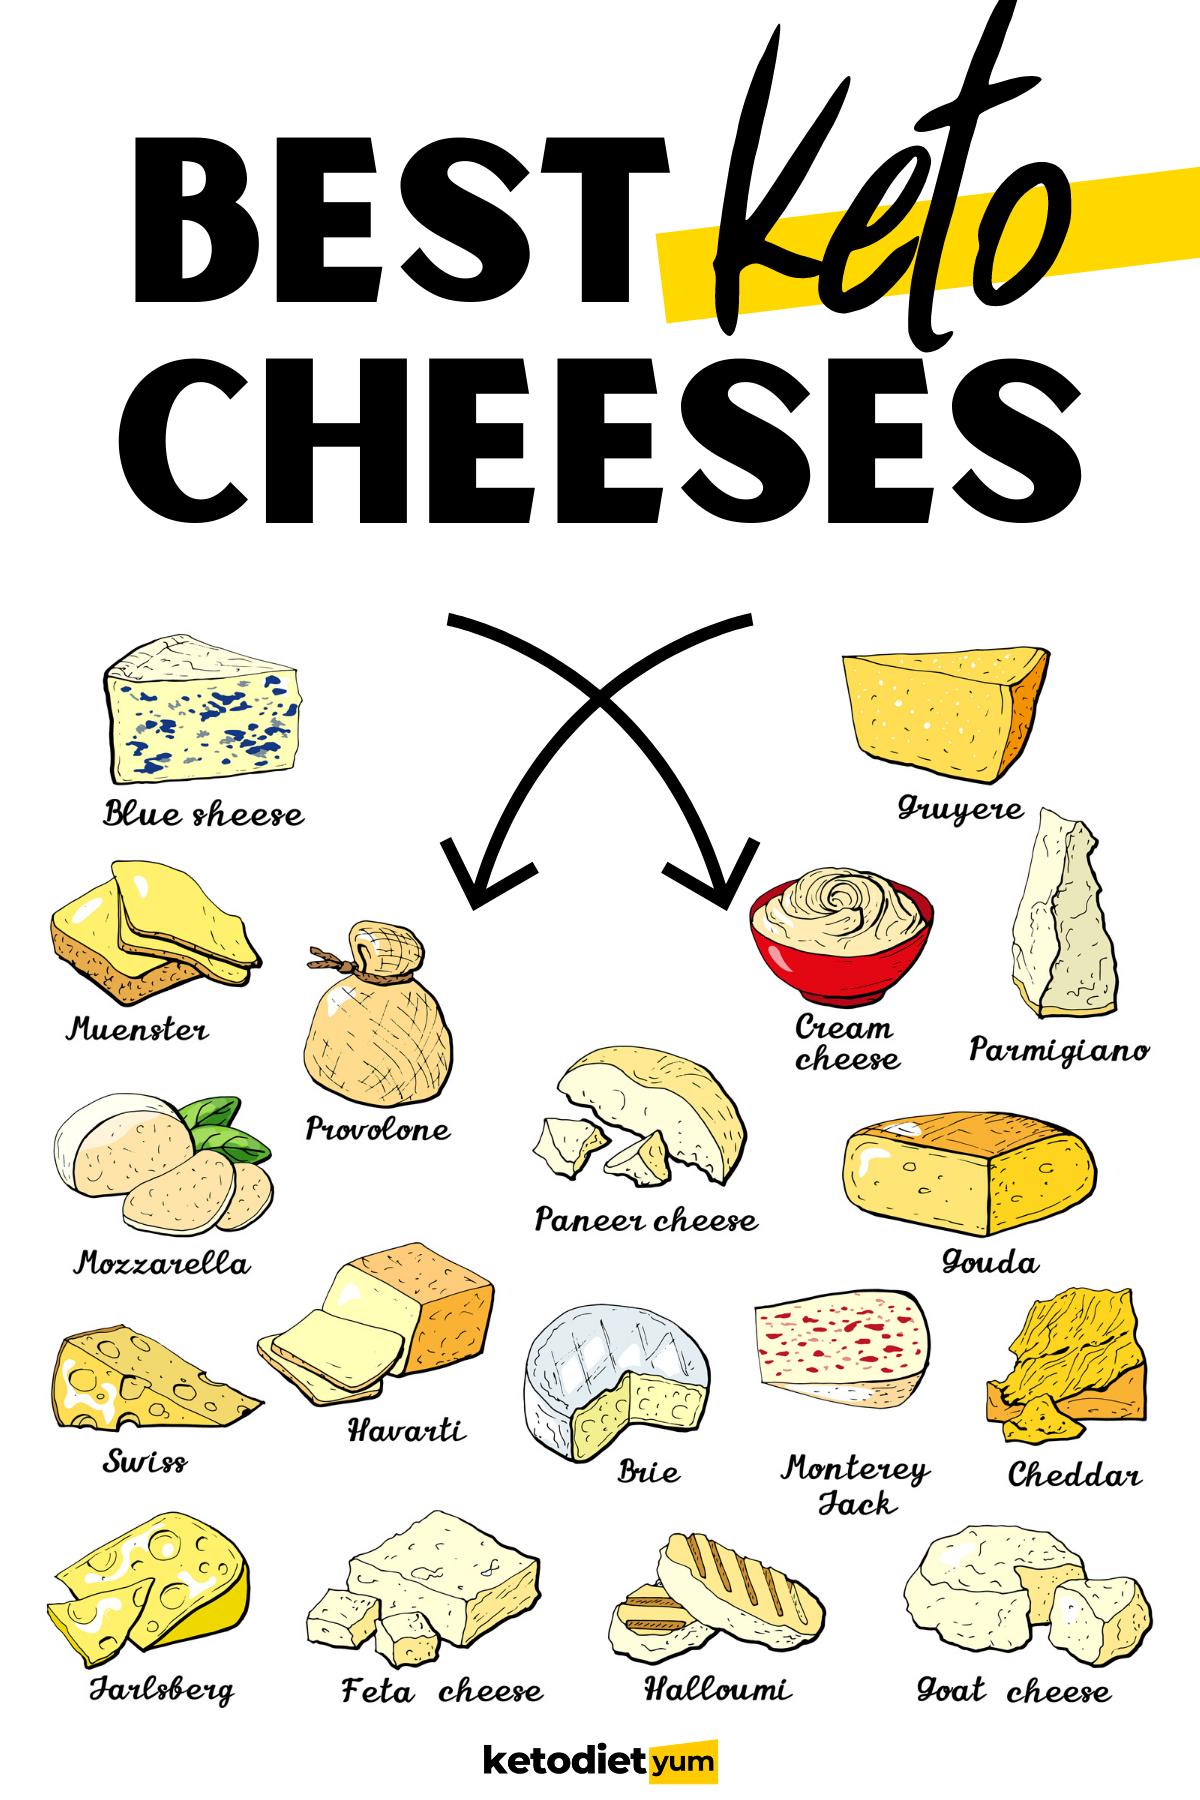 Keto Diet Cheese 7 Best Types To Eat Keto Diet Yum Keto Cheese Low Carb Keto Recipes Keto Diet